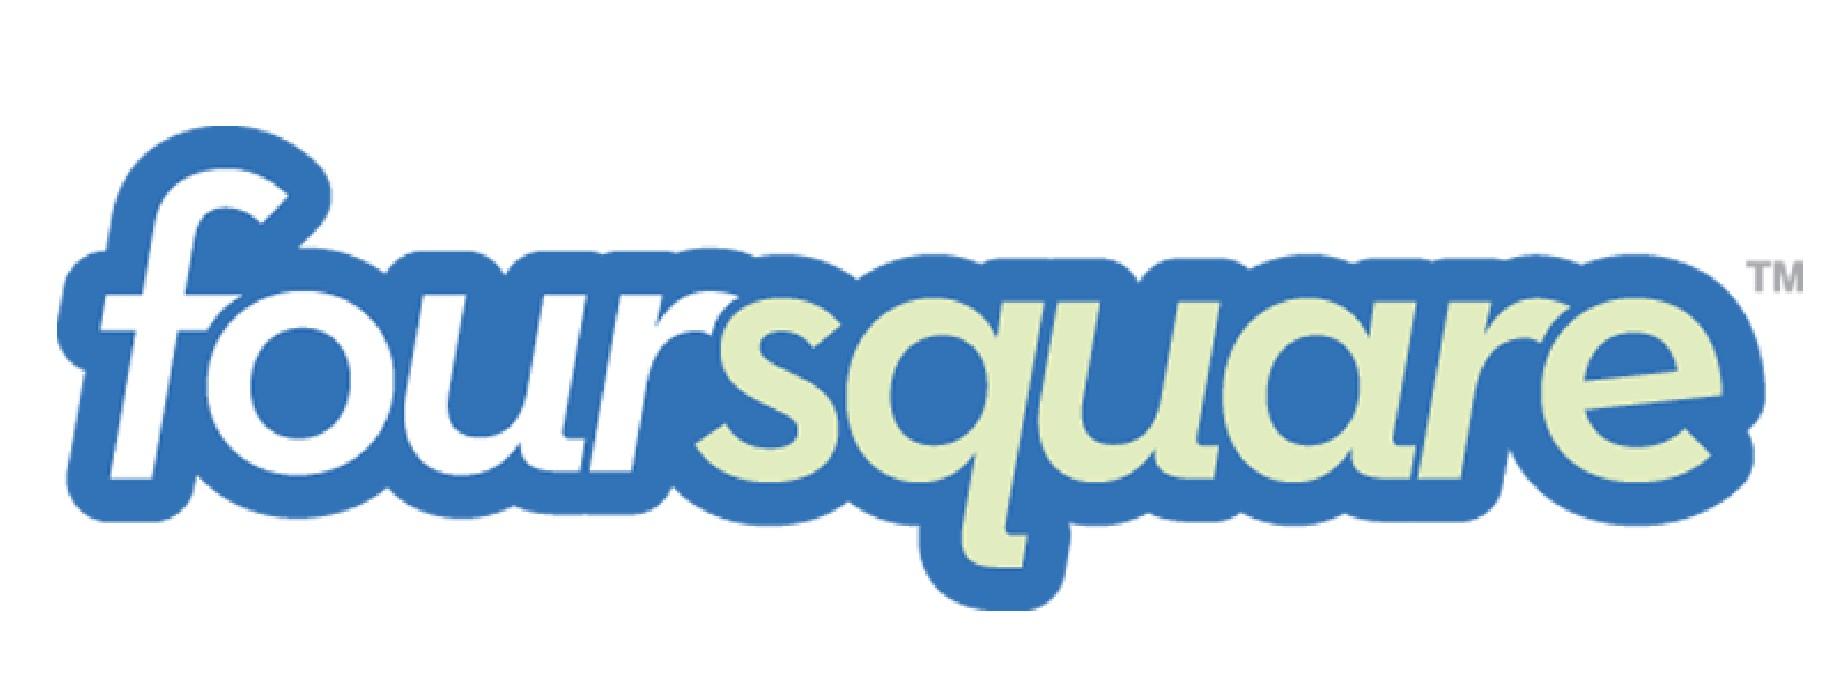 Imagen Foursquare